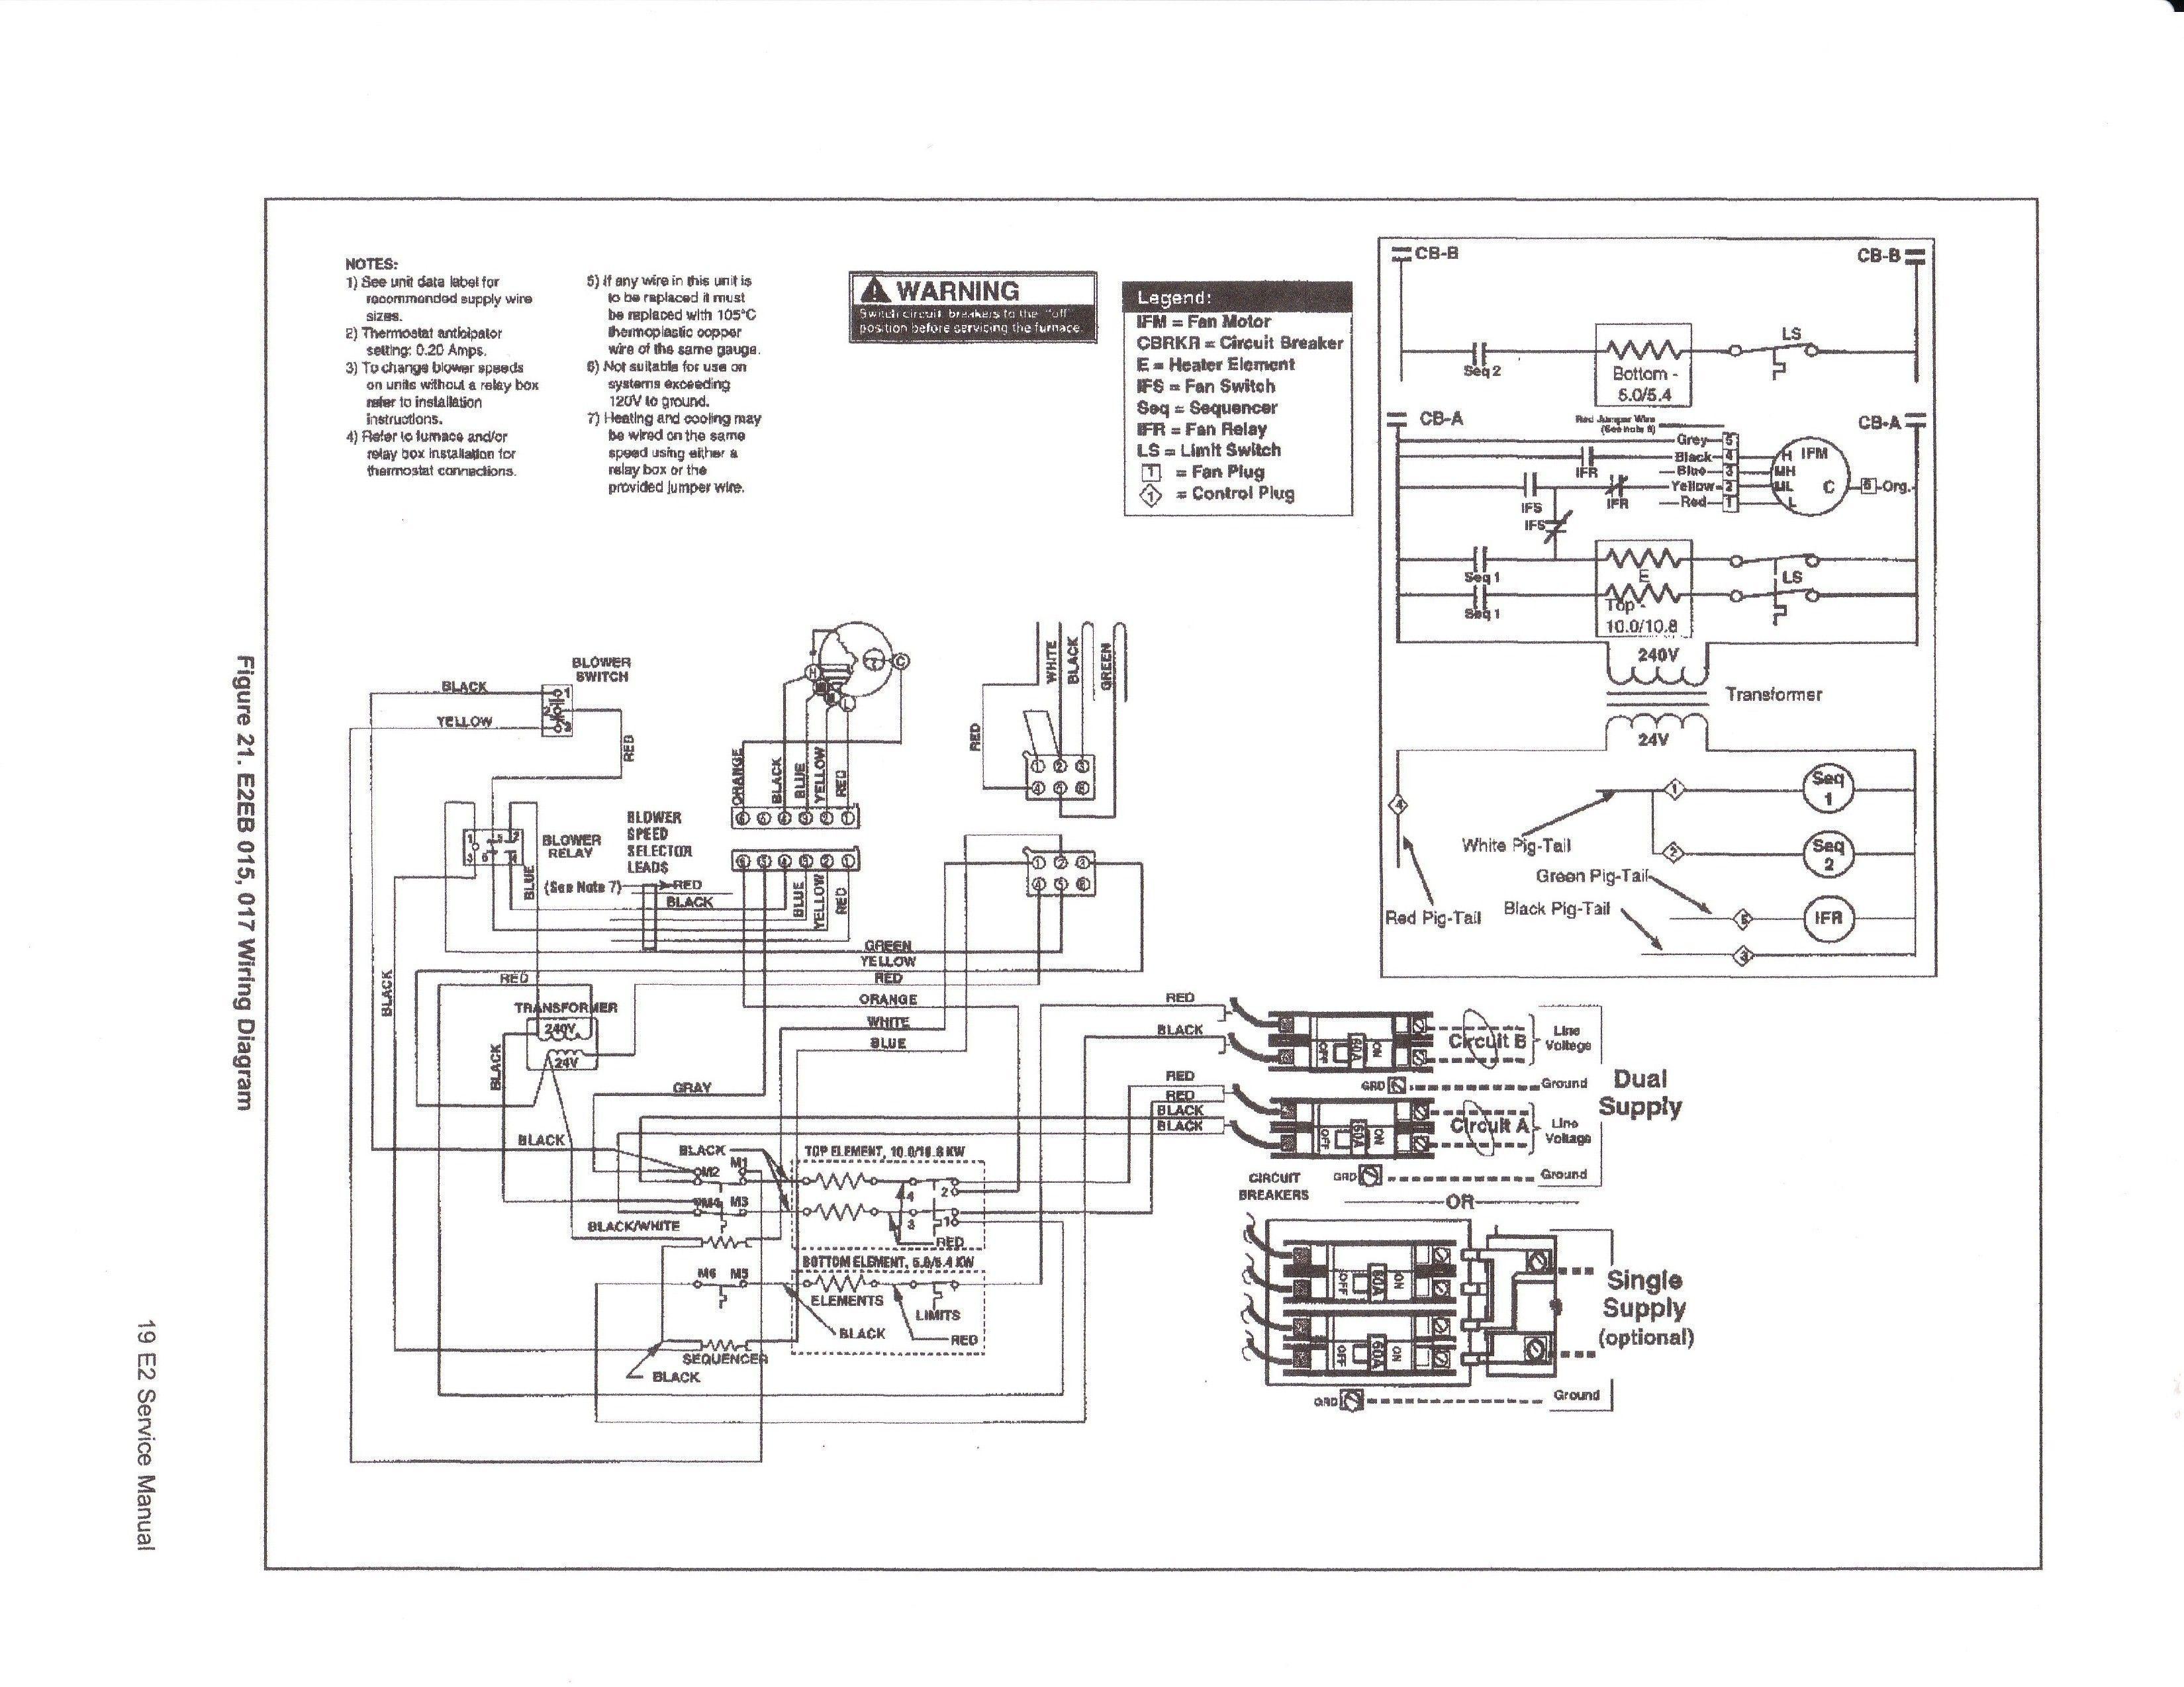 Best Of E2eb 015ha Wiring Diagram In 2020 Wire Diagram Informative